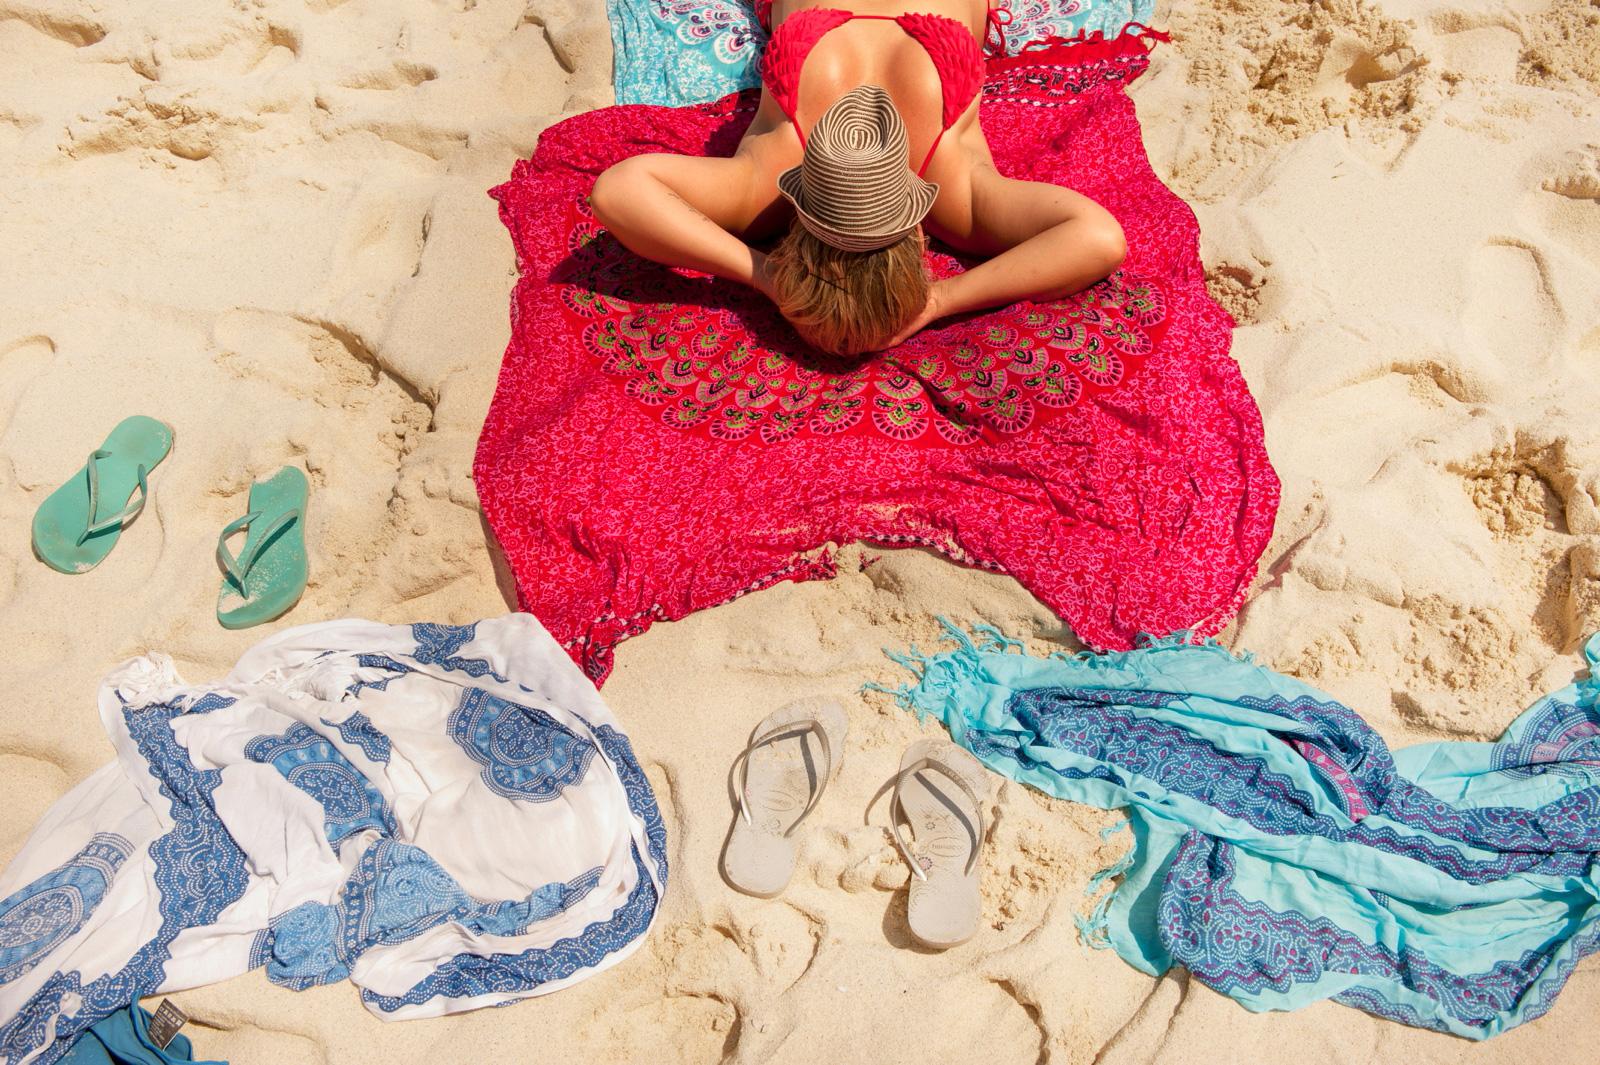 Girl lying on beach